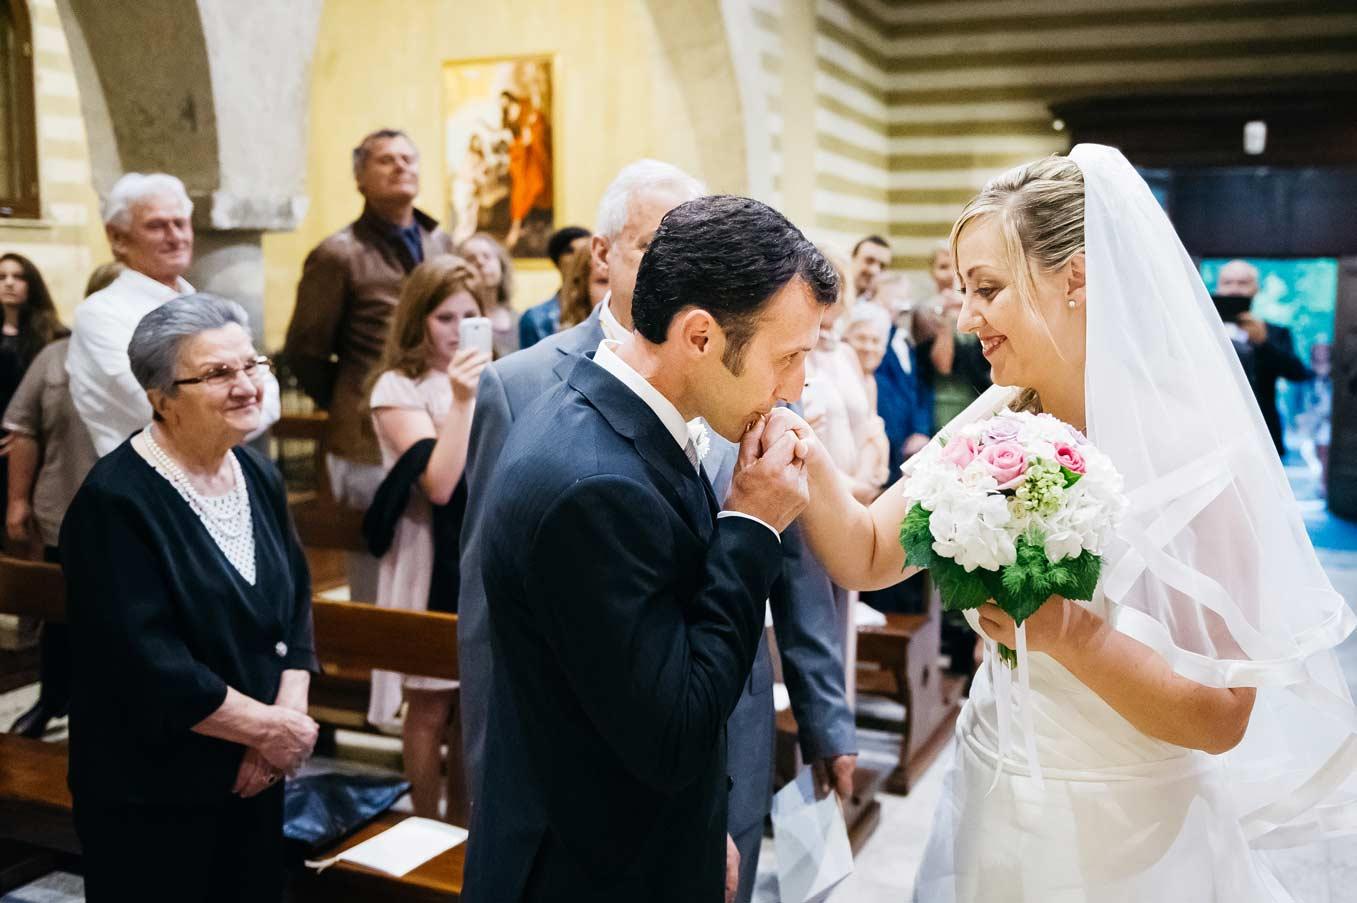 Fotografo-Matrimonio-Stile-Reportage-Roma-Cerimonia